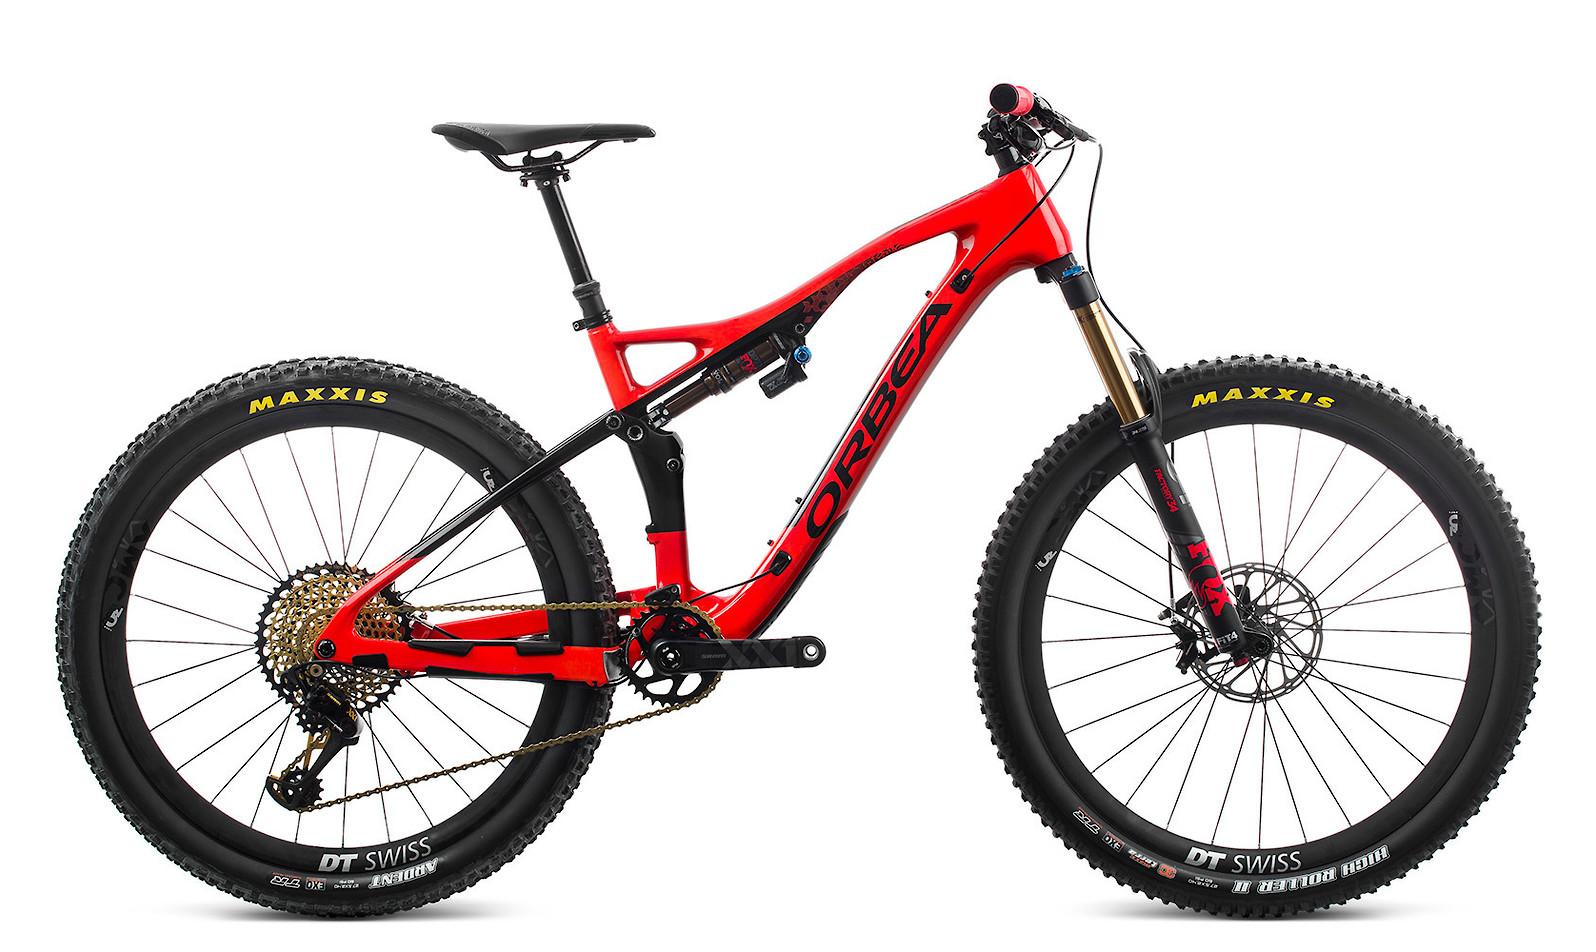 2019 Orbea Occam AM M-LTD Bike